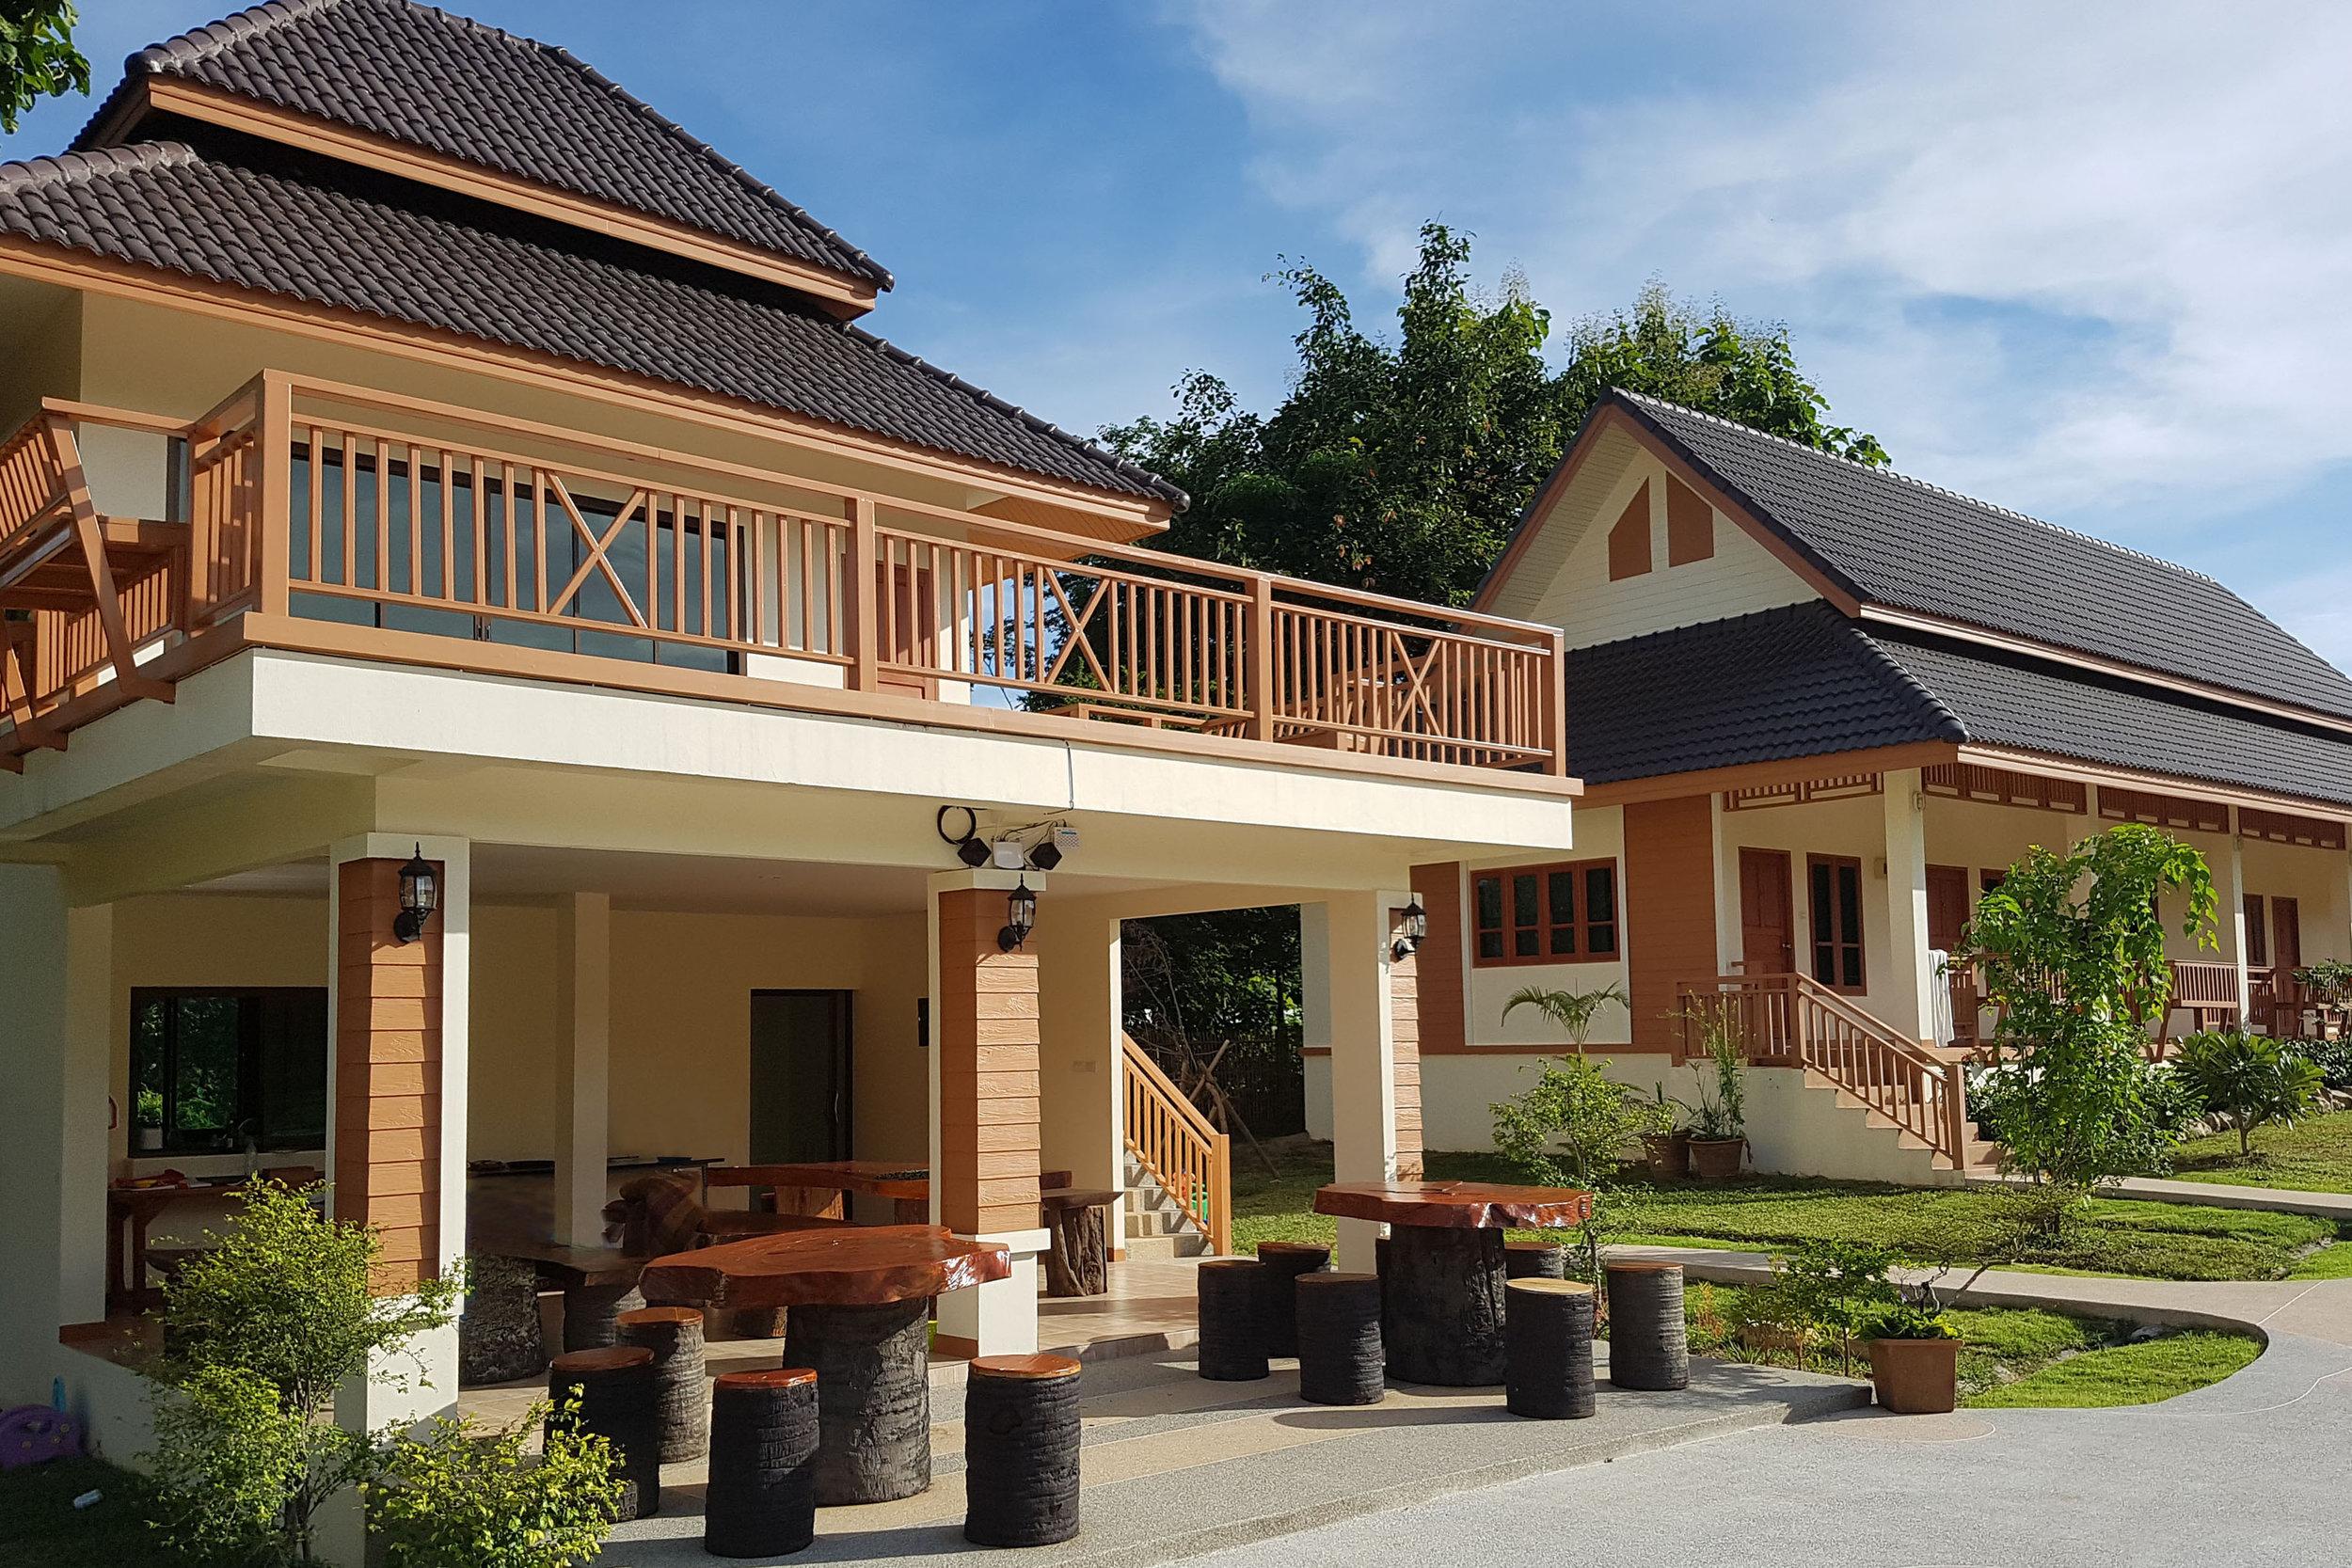 sabai sabai retreat center chiang mai thailand